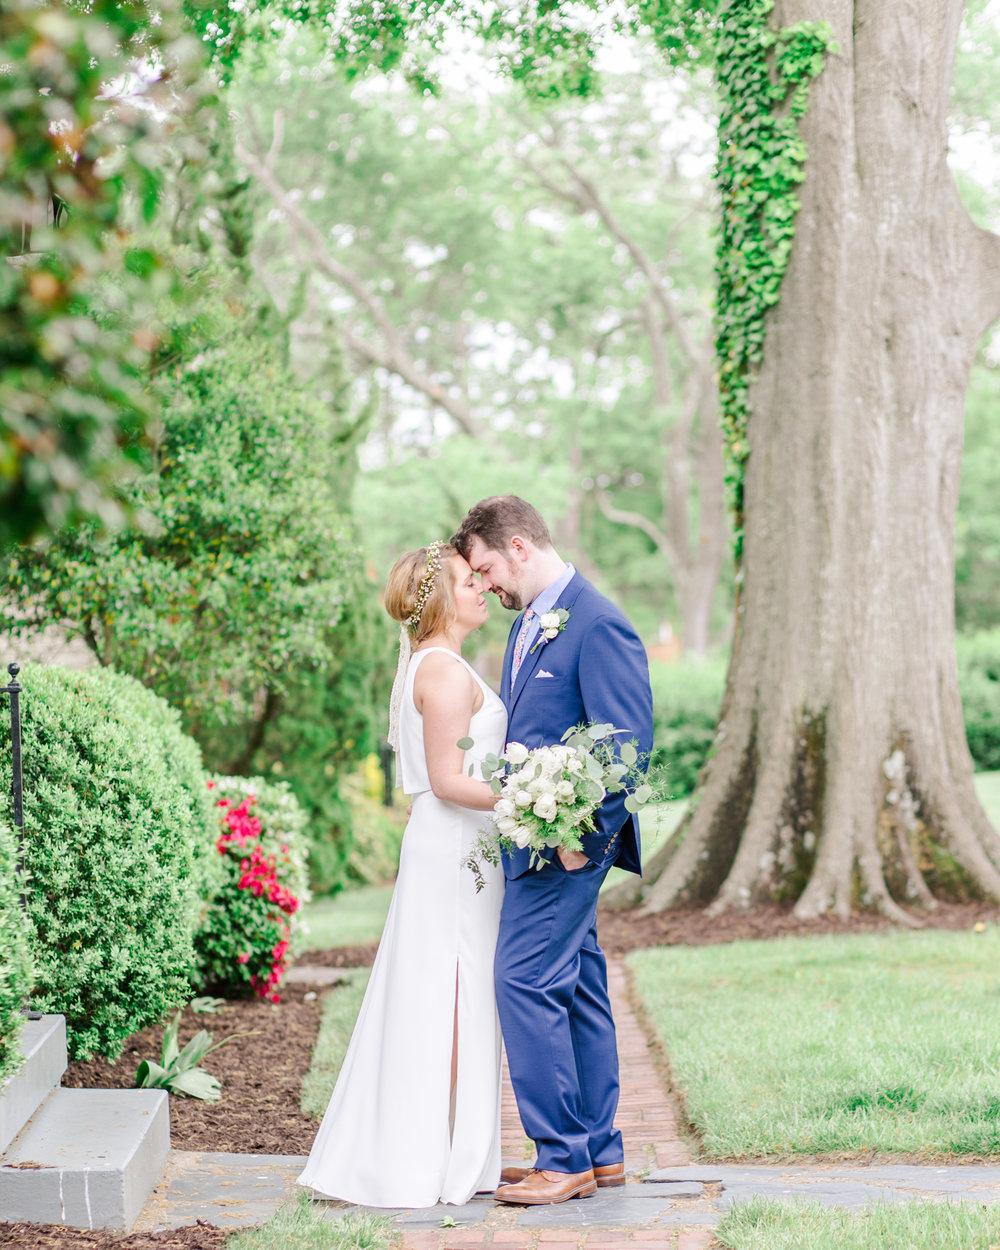 Richmond Wedding Photographer - Bridal Guide